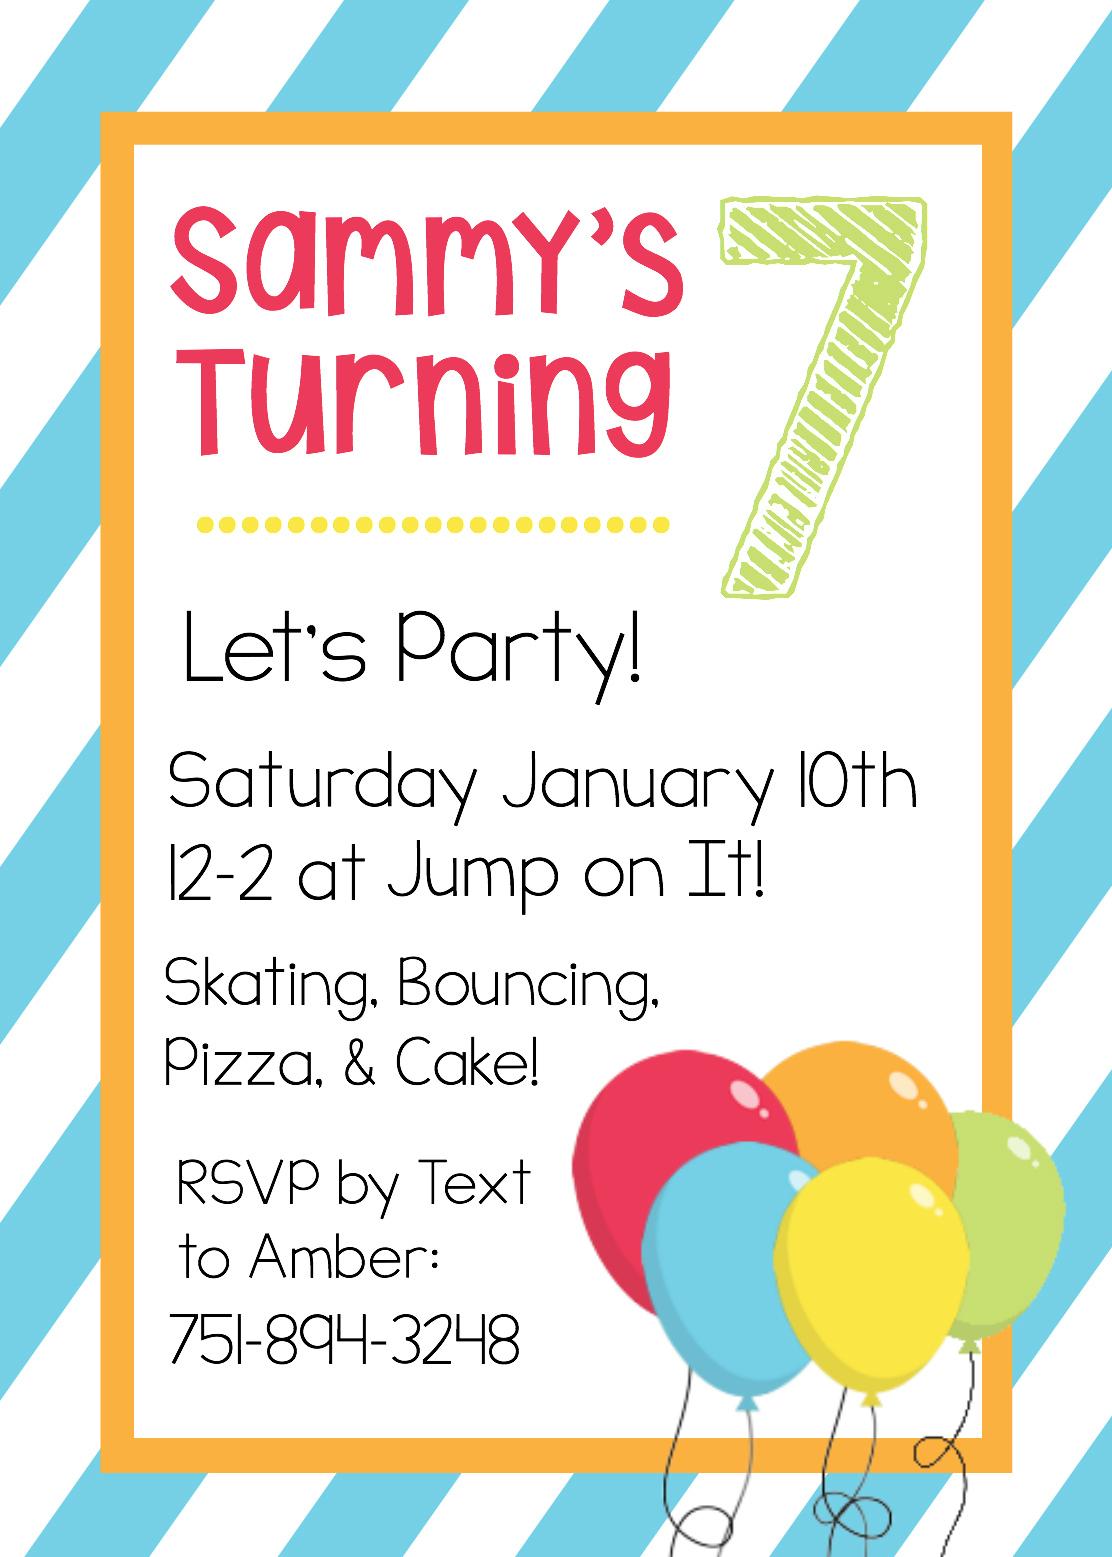 Free Printable Birthday Invitation Templates - Free Printable Pool Party Invitations